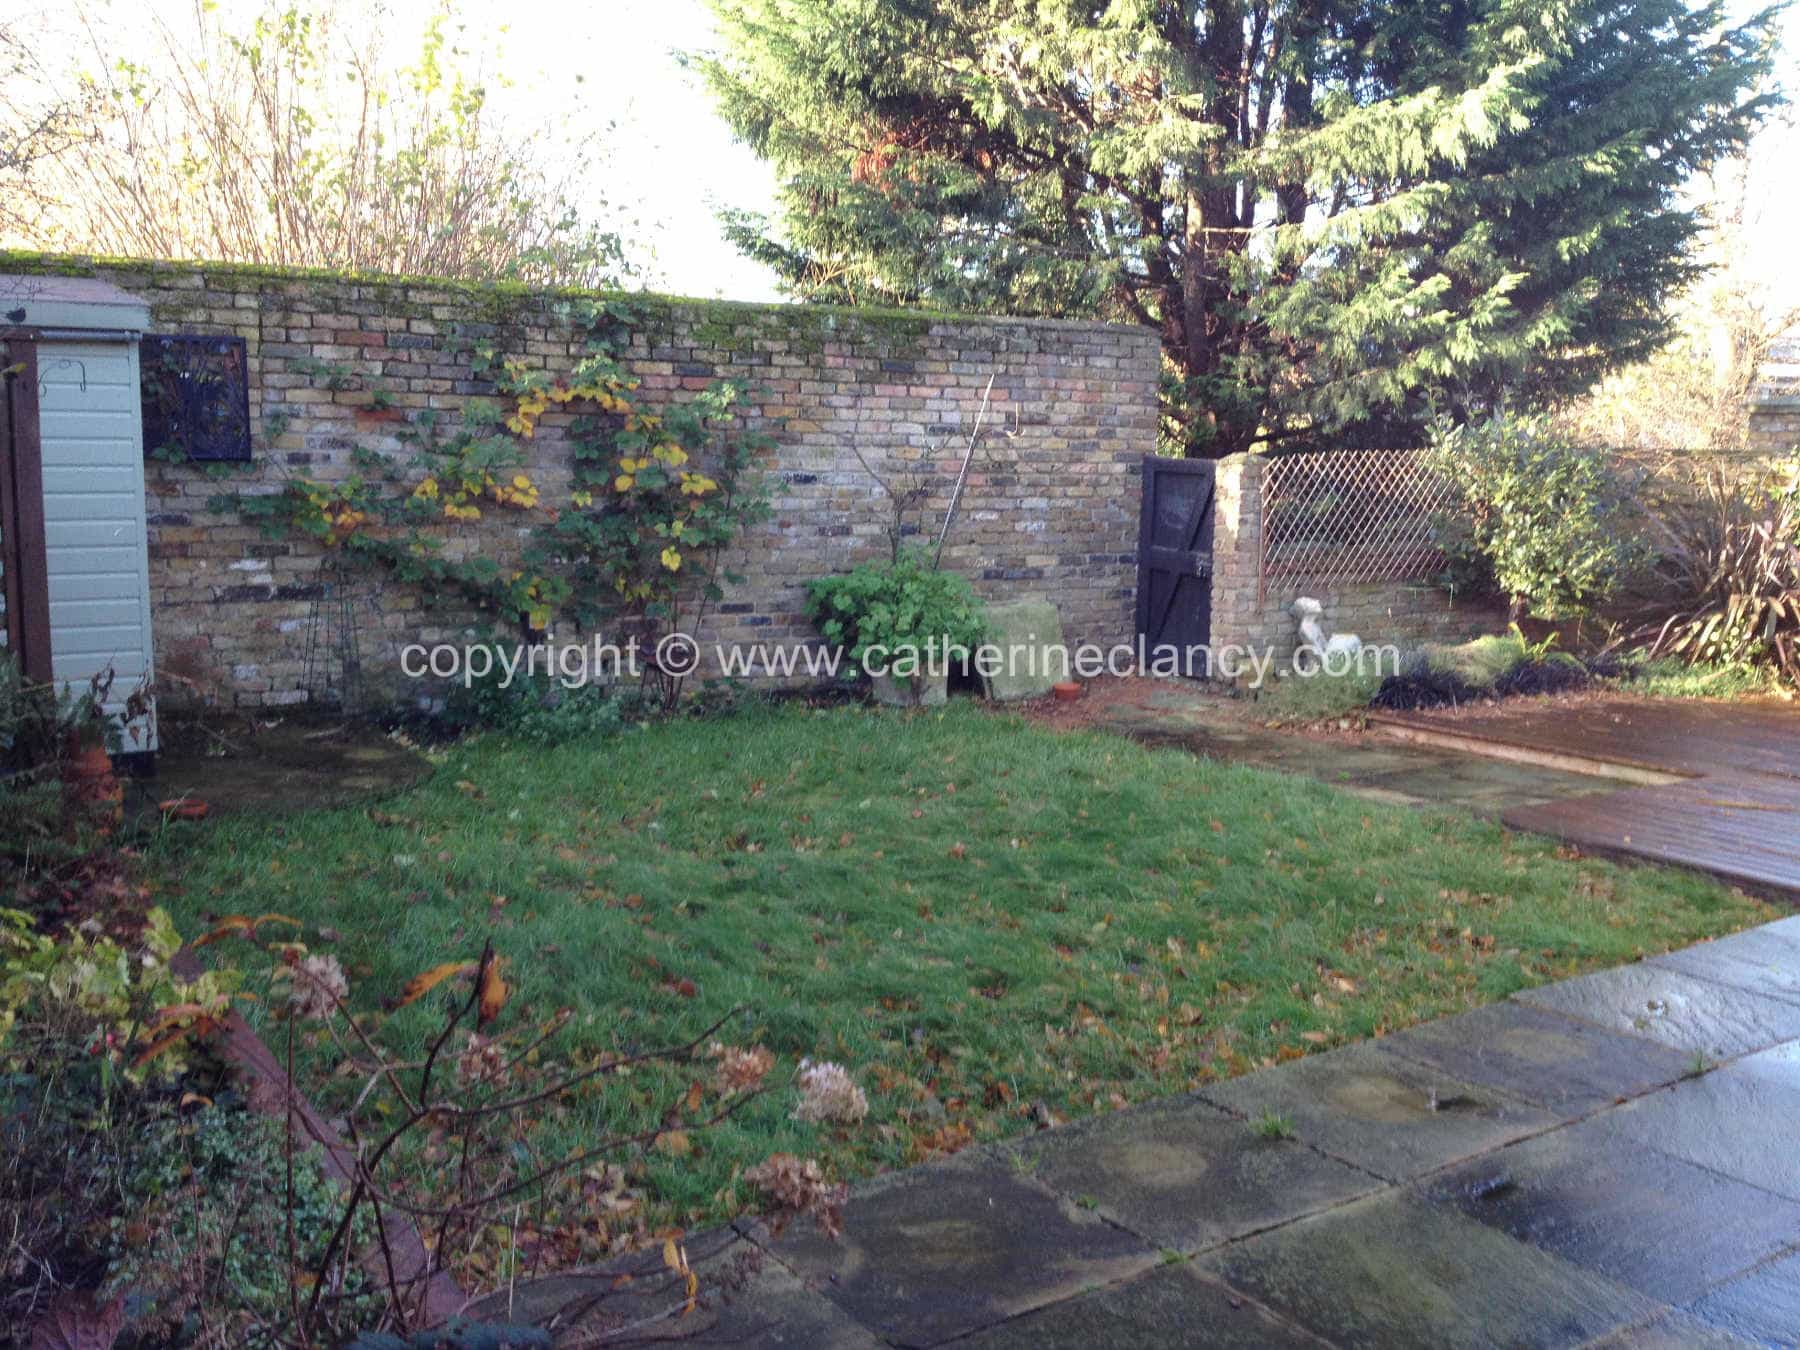 blackheath-courtyard-12